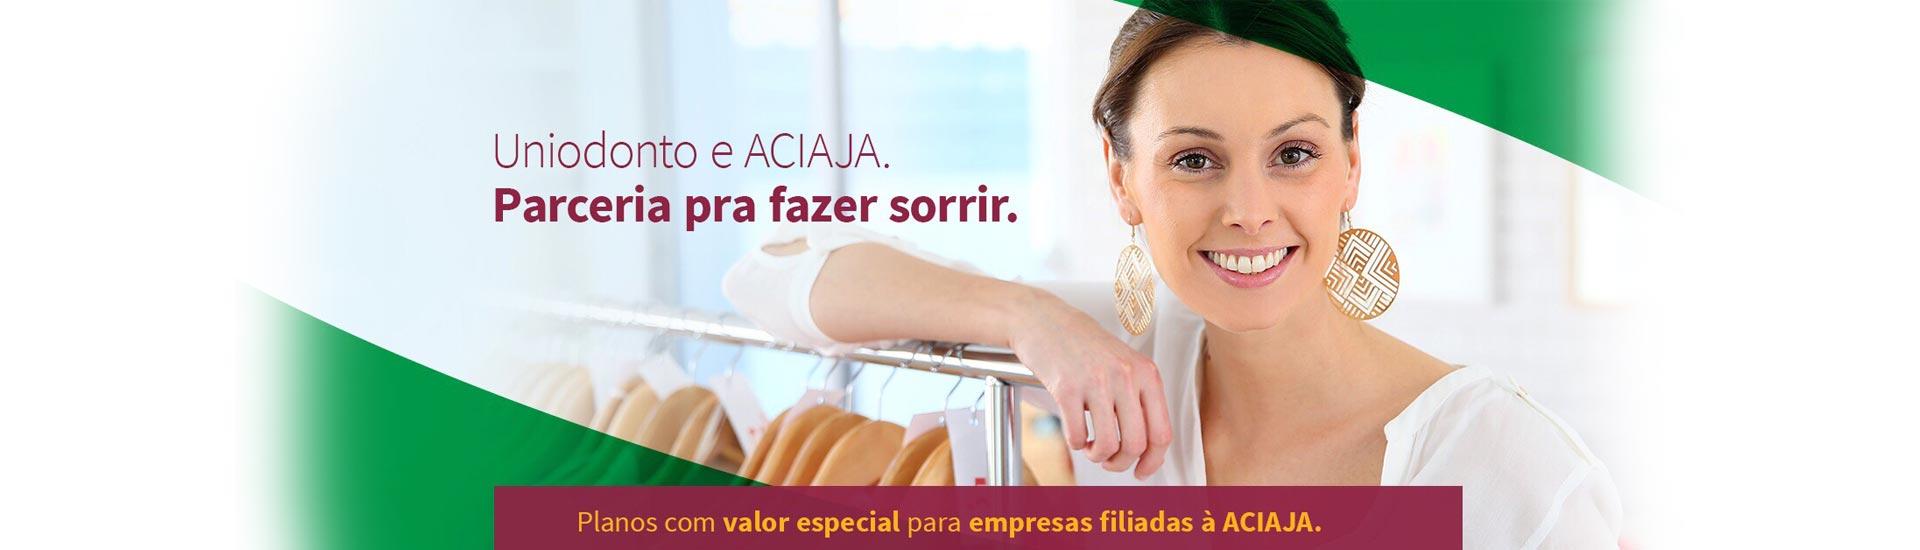 banner-aciaja-uniodonto-parceria